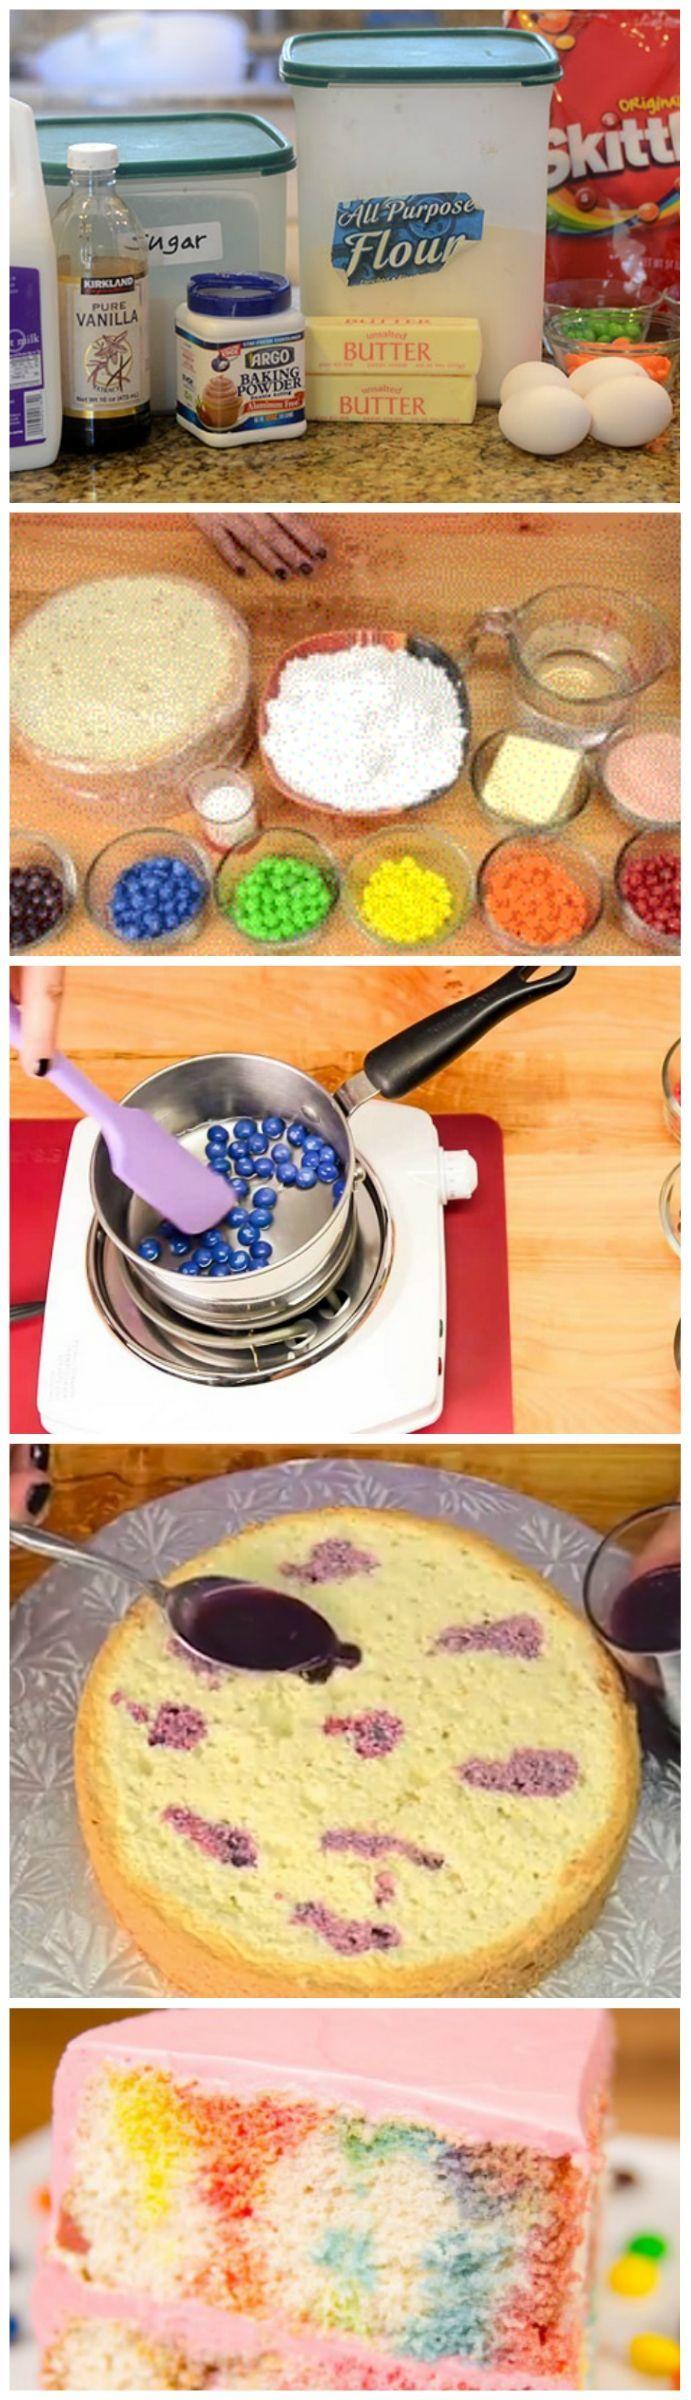 Skittles Poke Cake